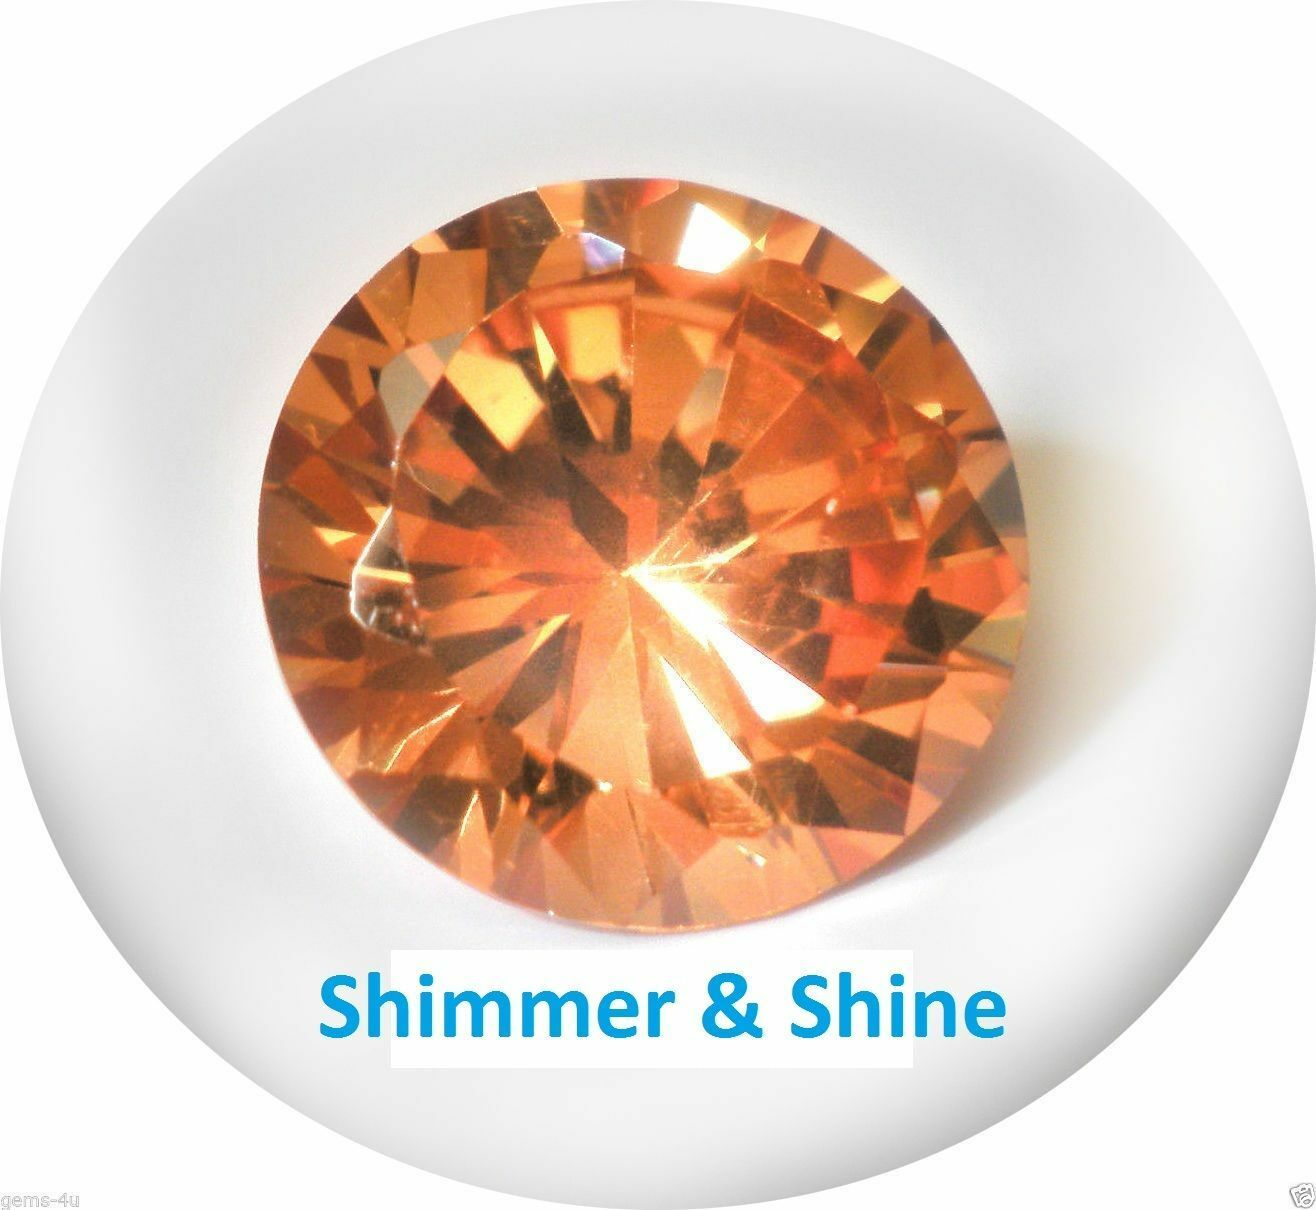 Shimmer & Shine Gems & Jewelry